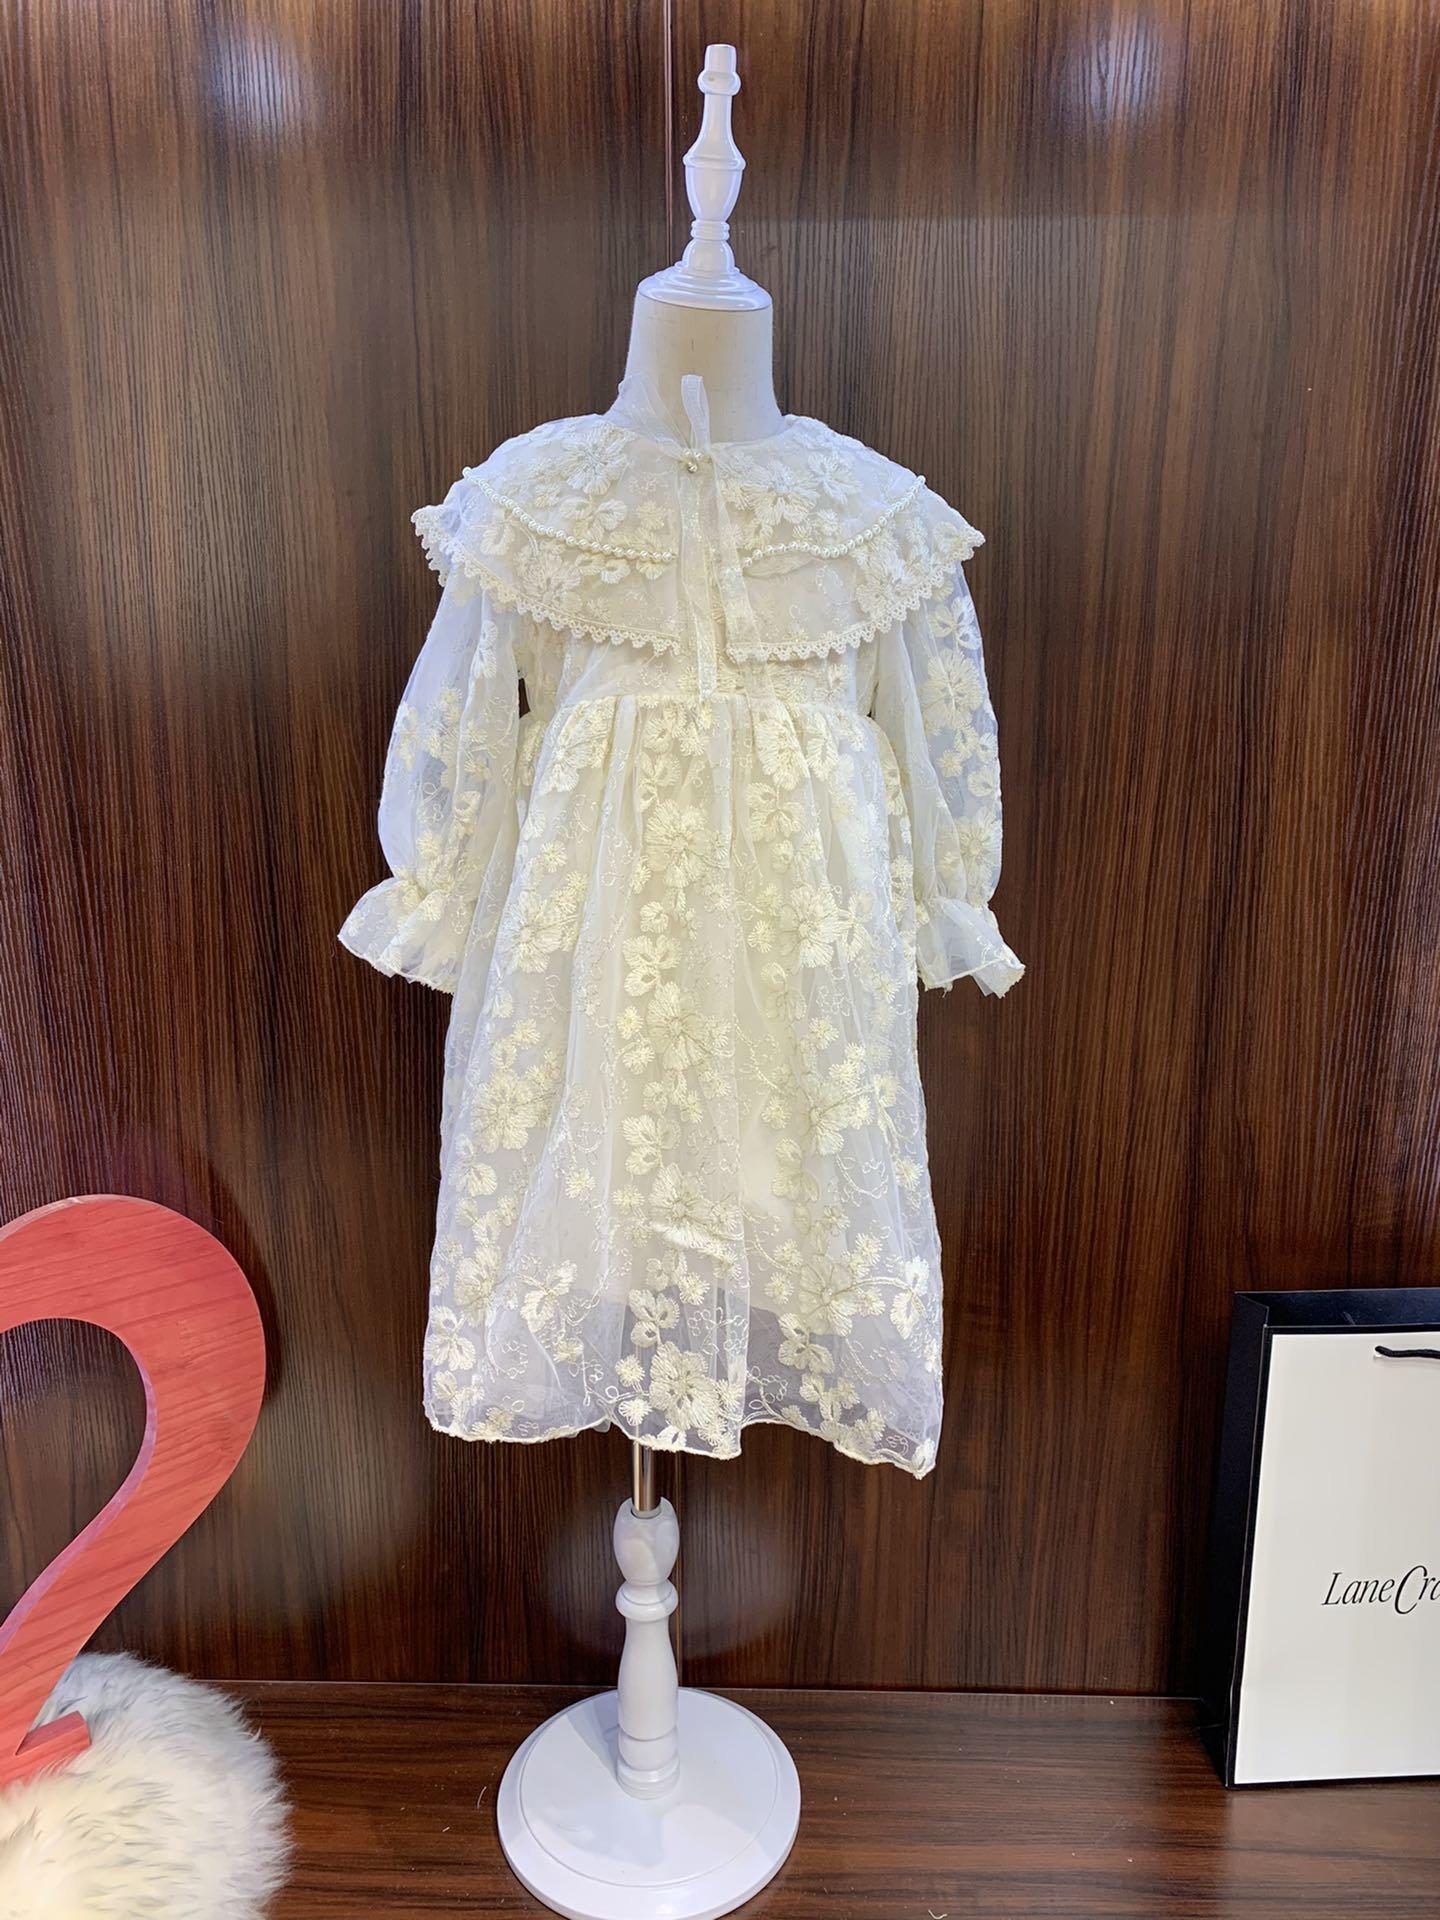 N8WZkids sevimli moda kız nefes ve rahat pamuklu oyun parti etek yapılmış elbise etek